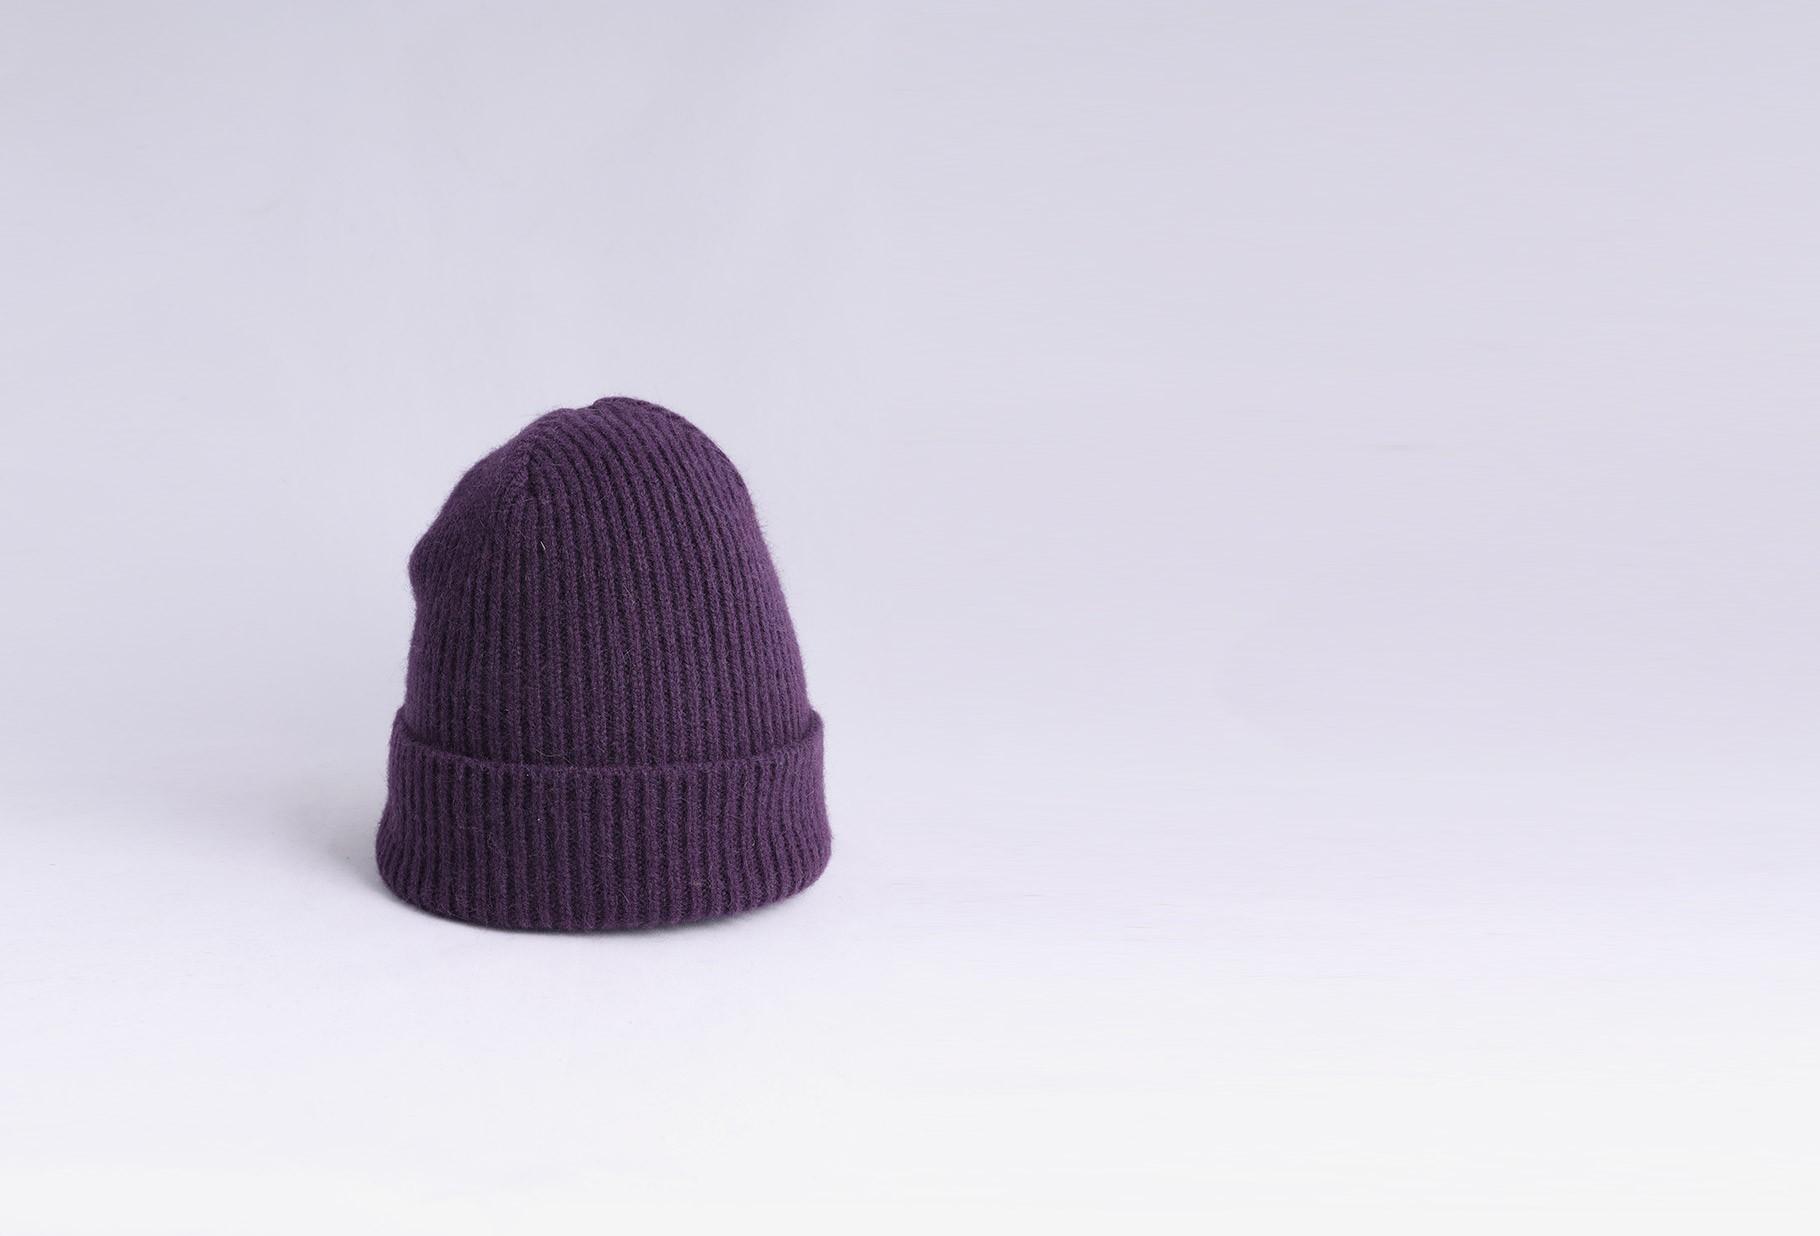 MACKIE / Barra hat Emperor